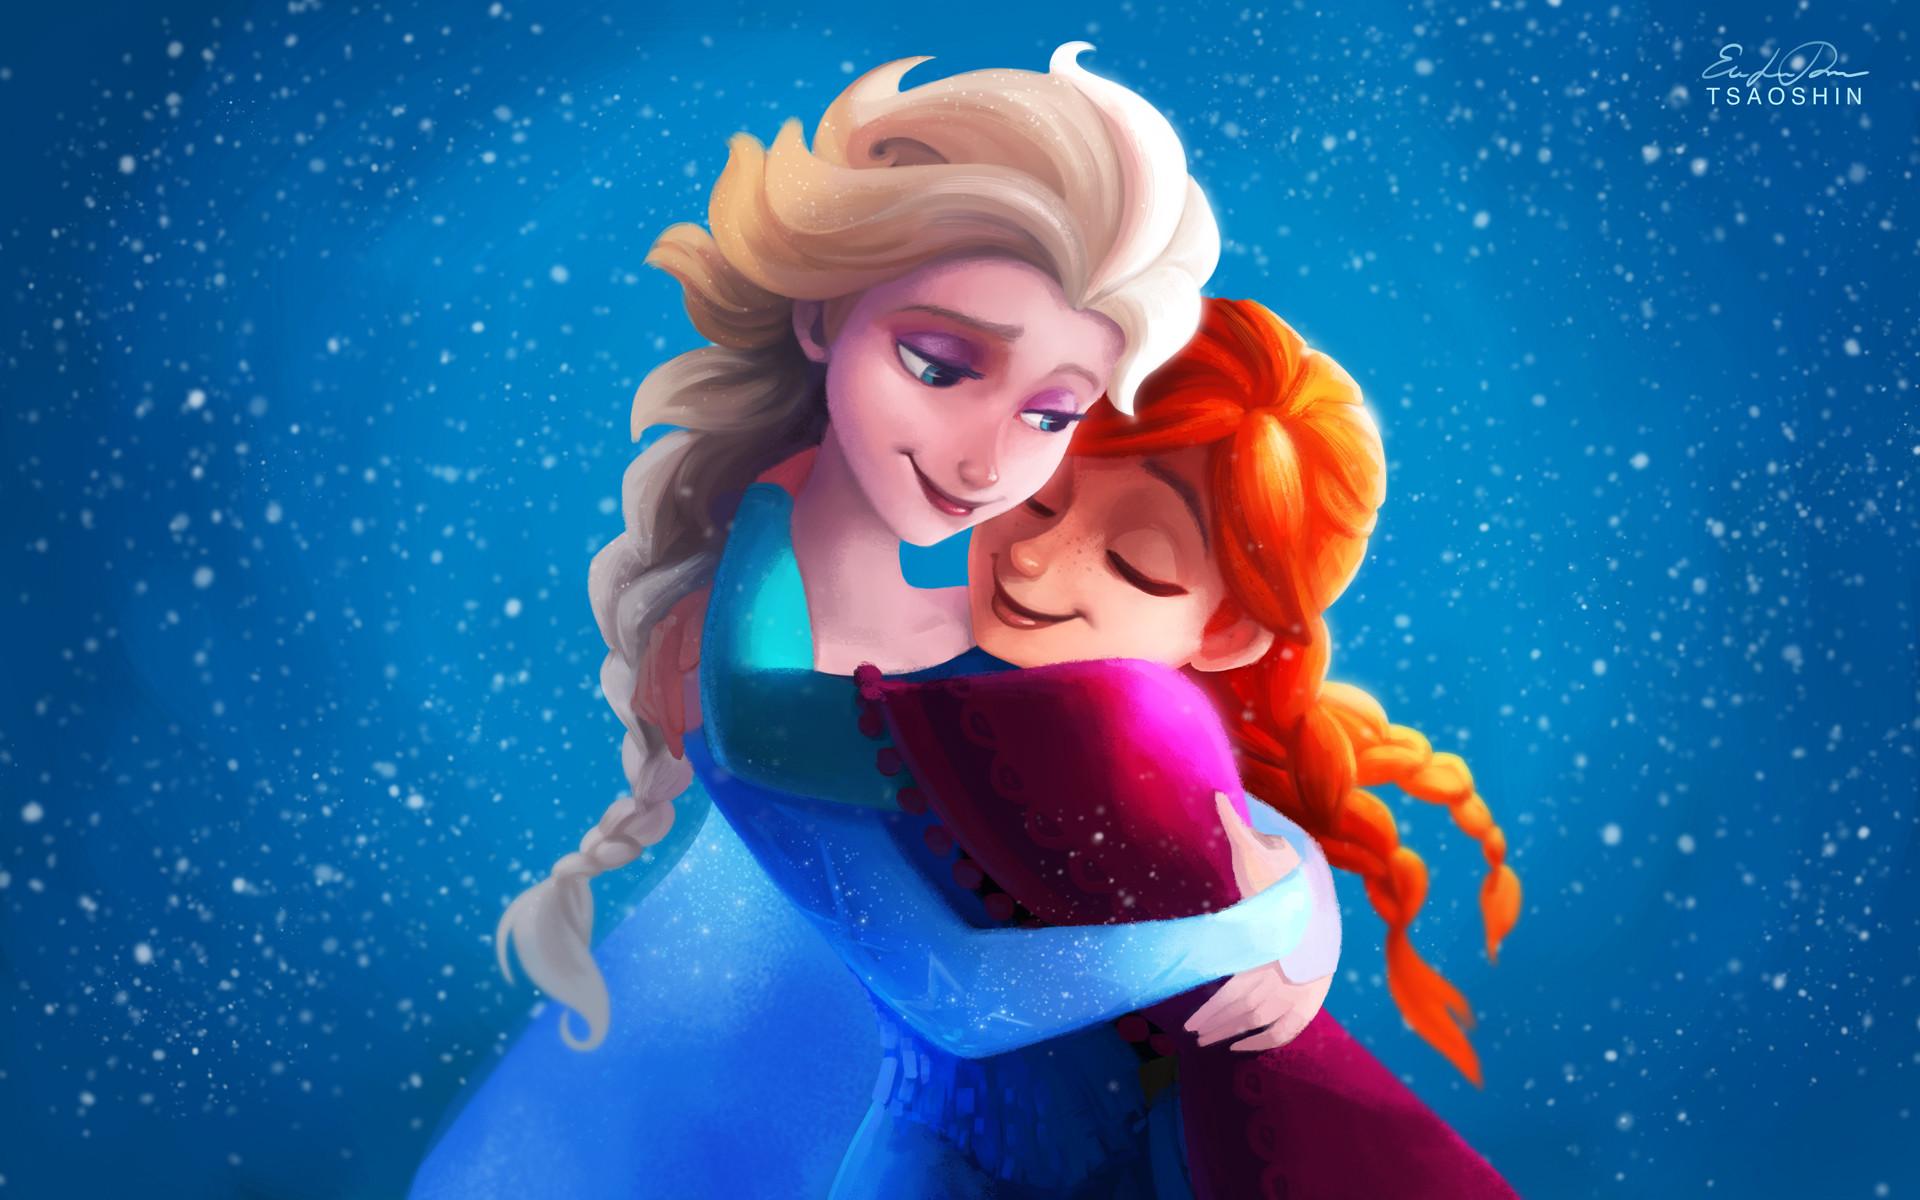 Elsa Frozen Wallpaper Phone 71 Images